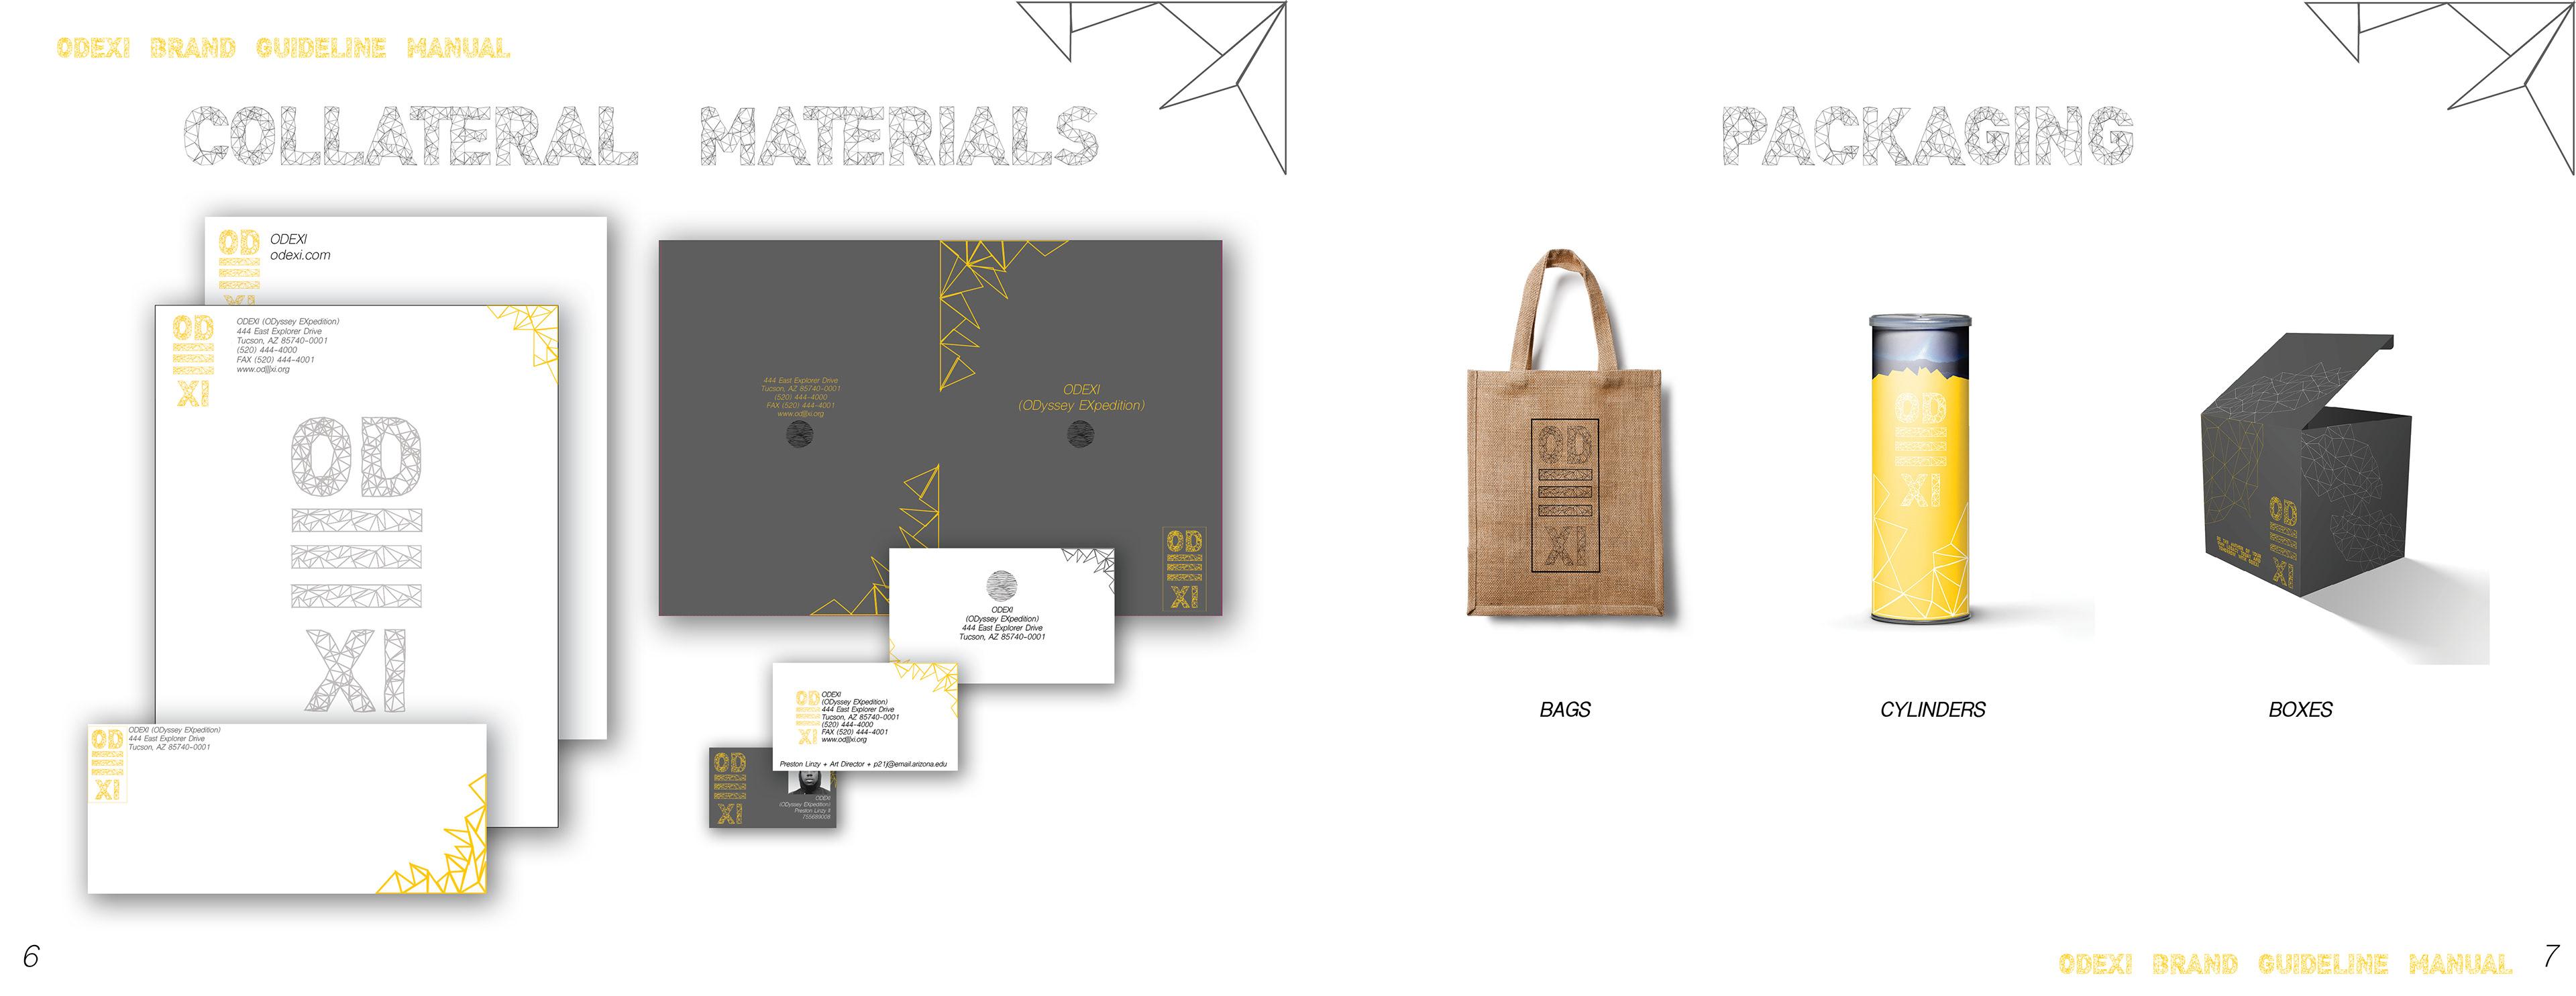 Design Illustration by Preston Linzy II ODEXI Brand Identity Manual